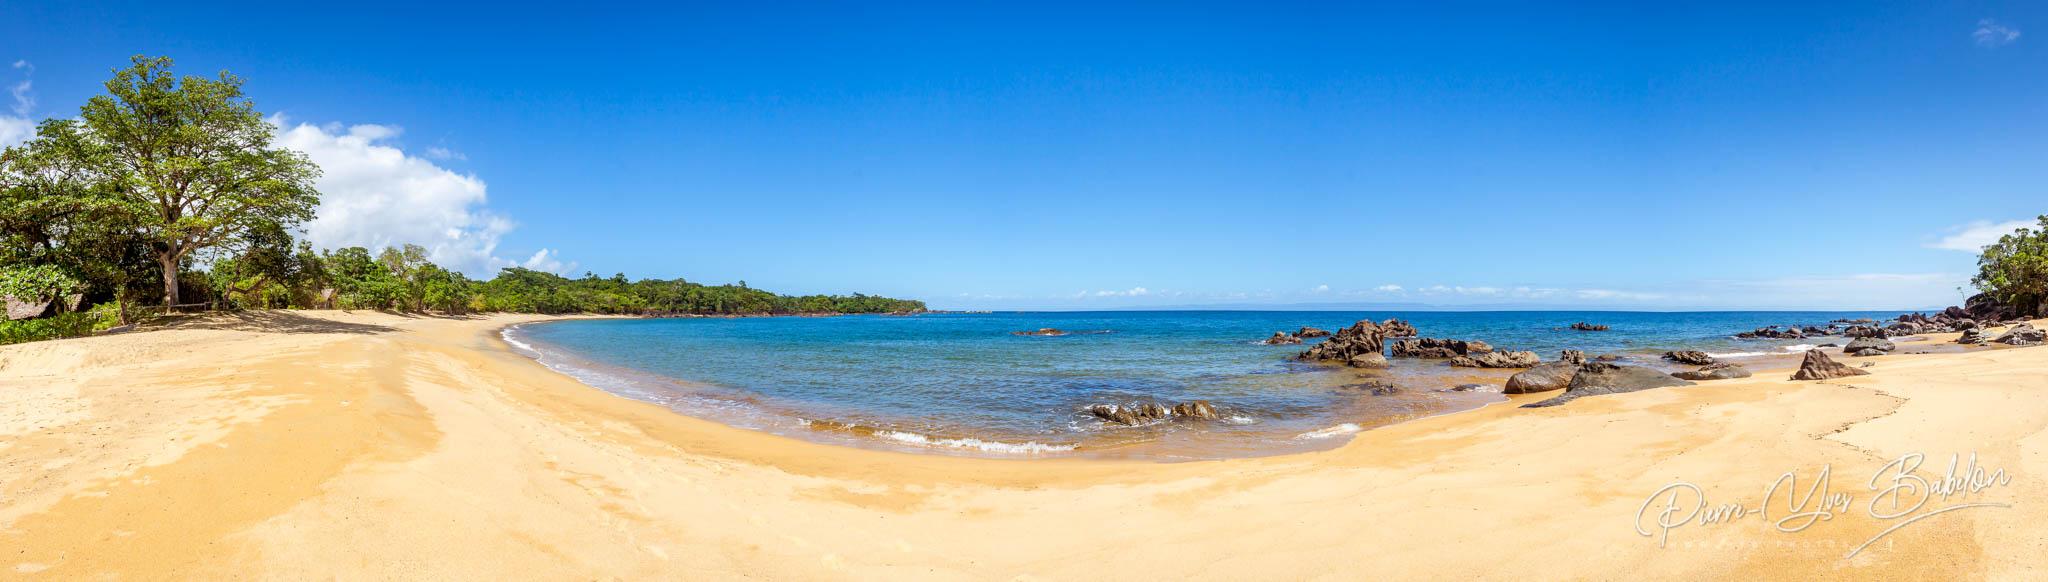 Tampolo marine reserve